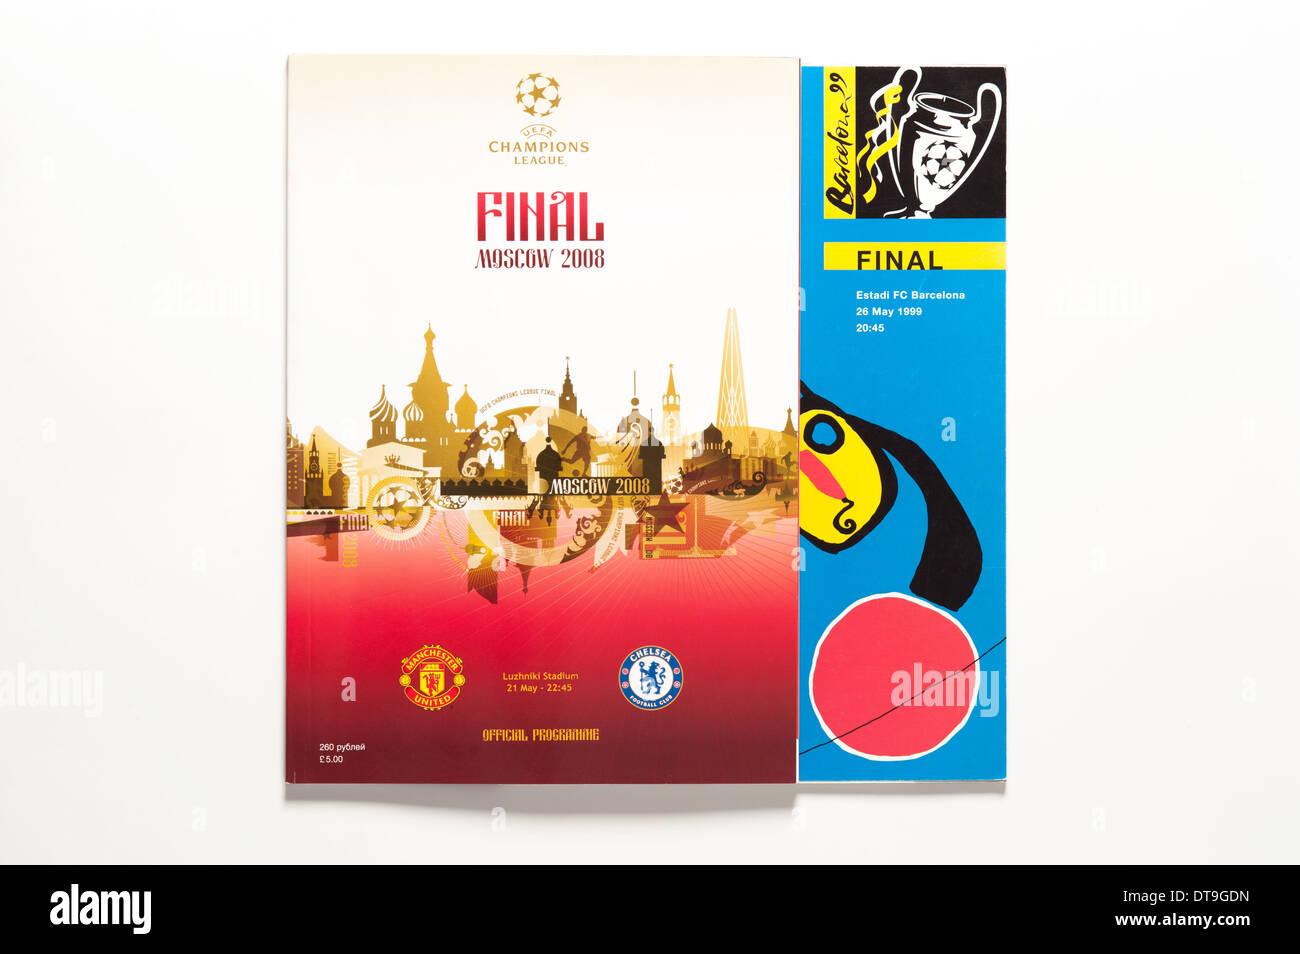 UEFA Champions League Final 1999 2008